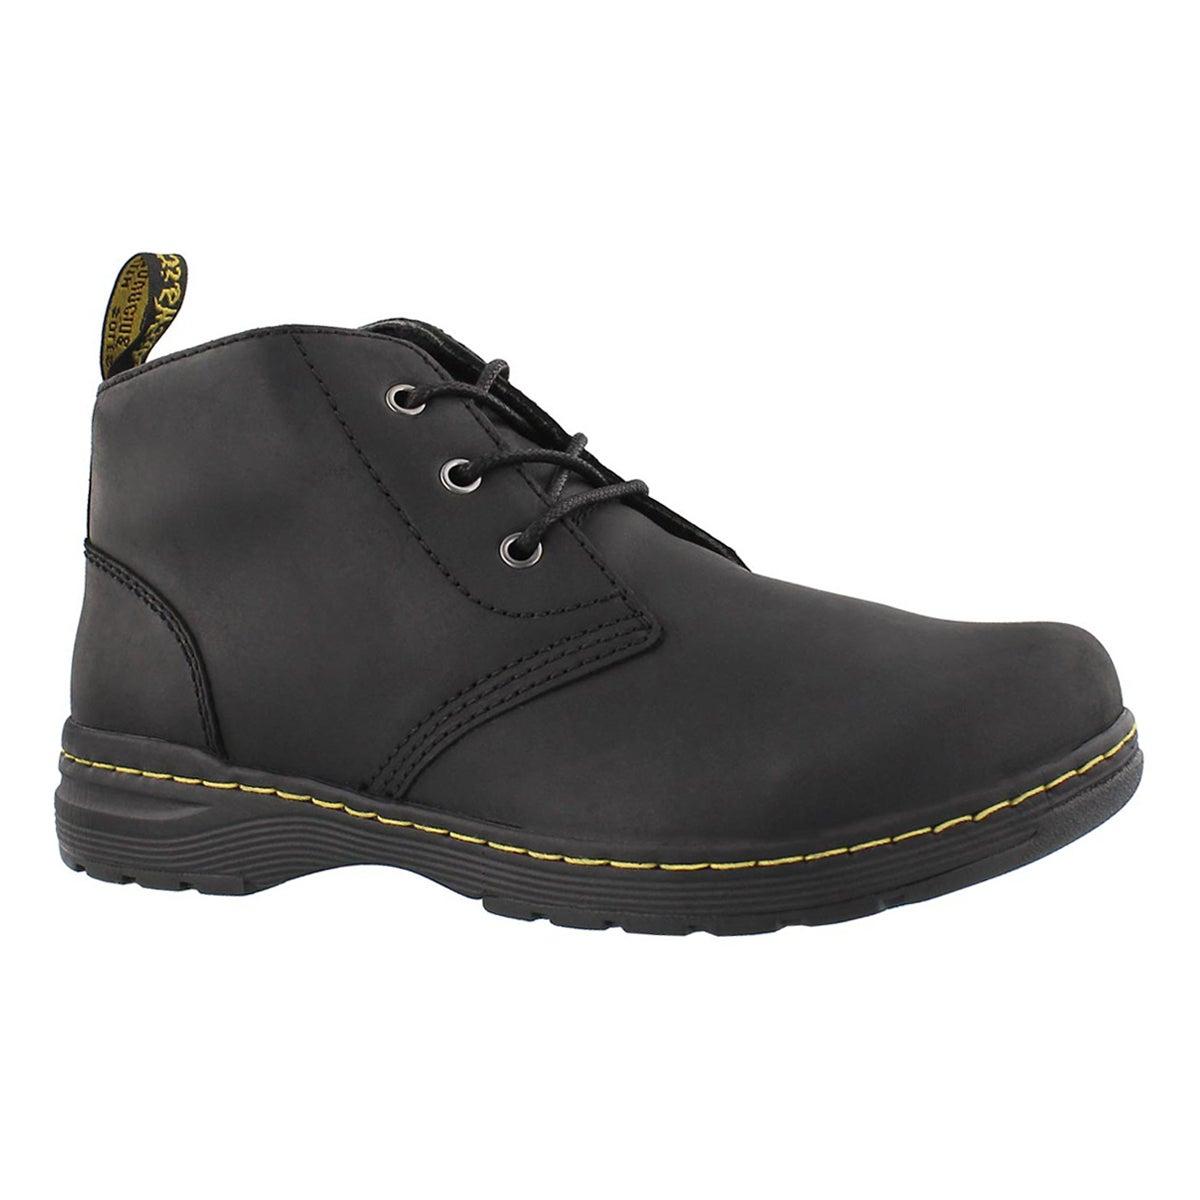 Men's EMIL black oily leather chukka boot